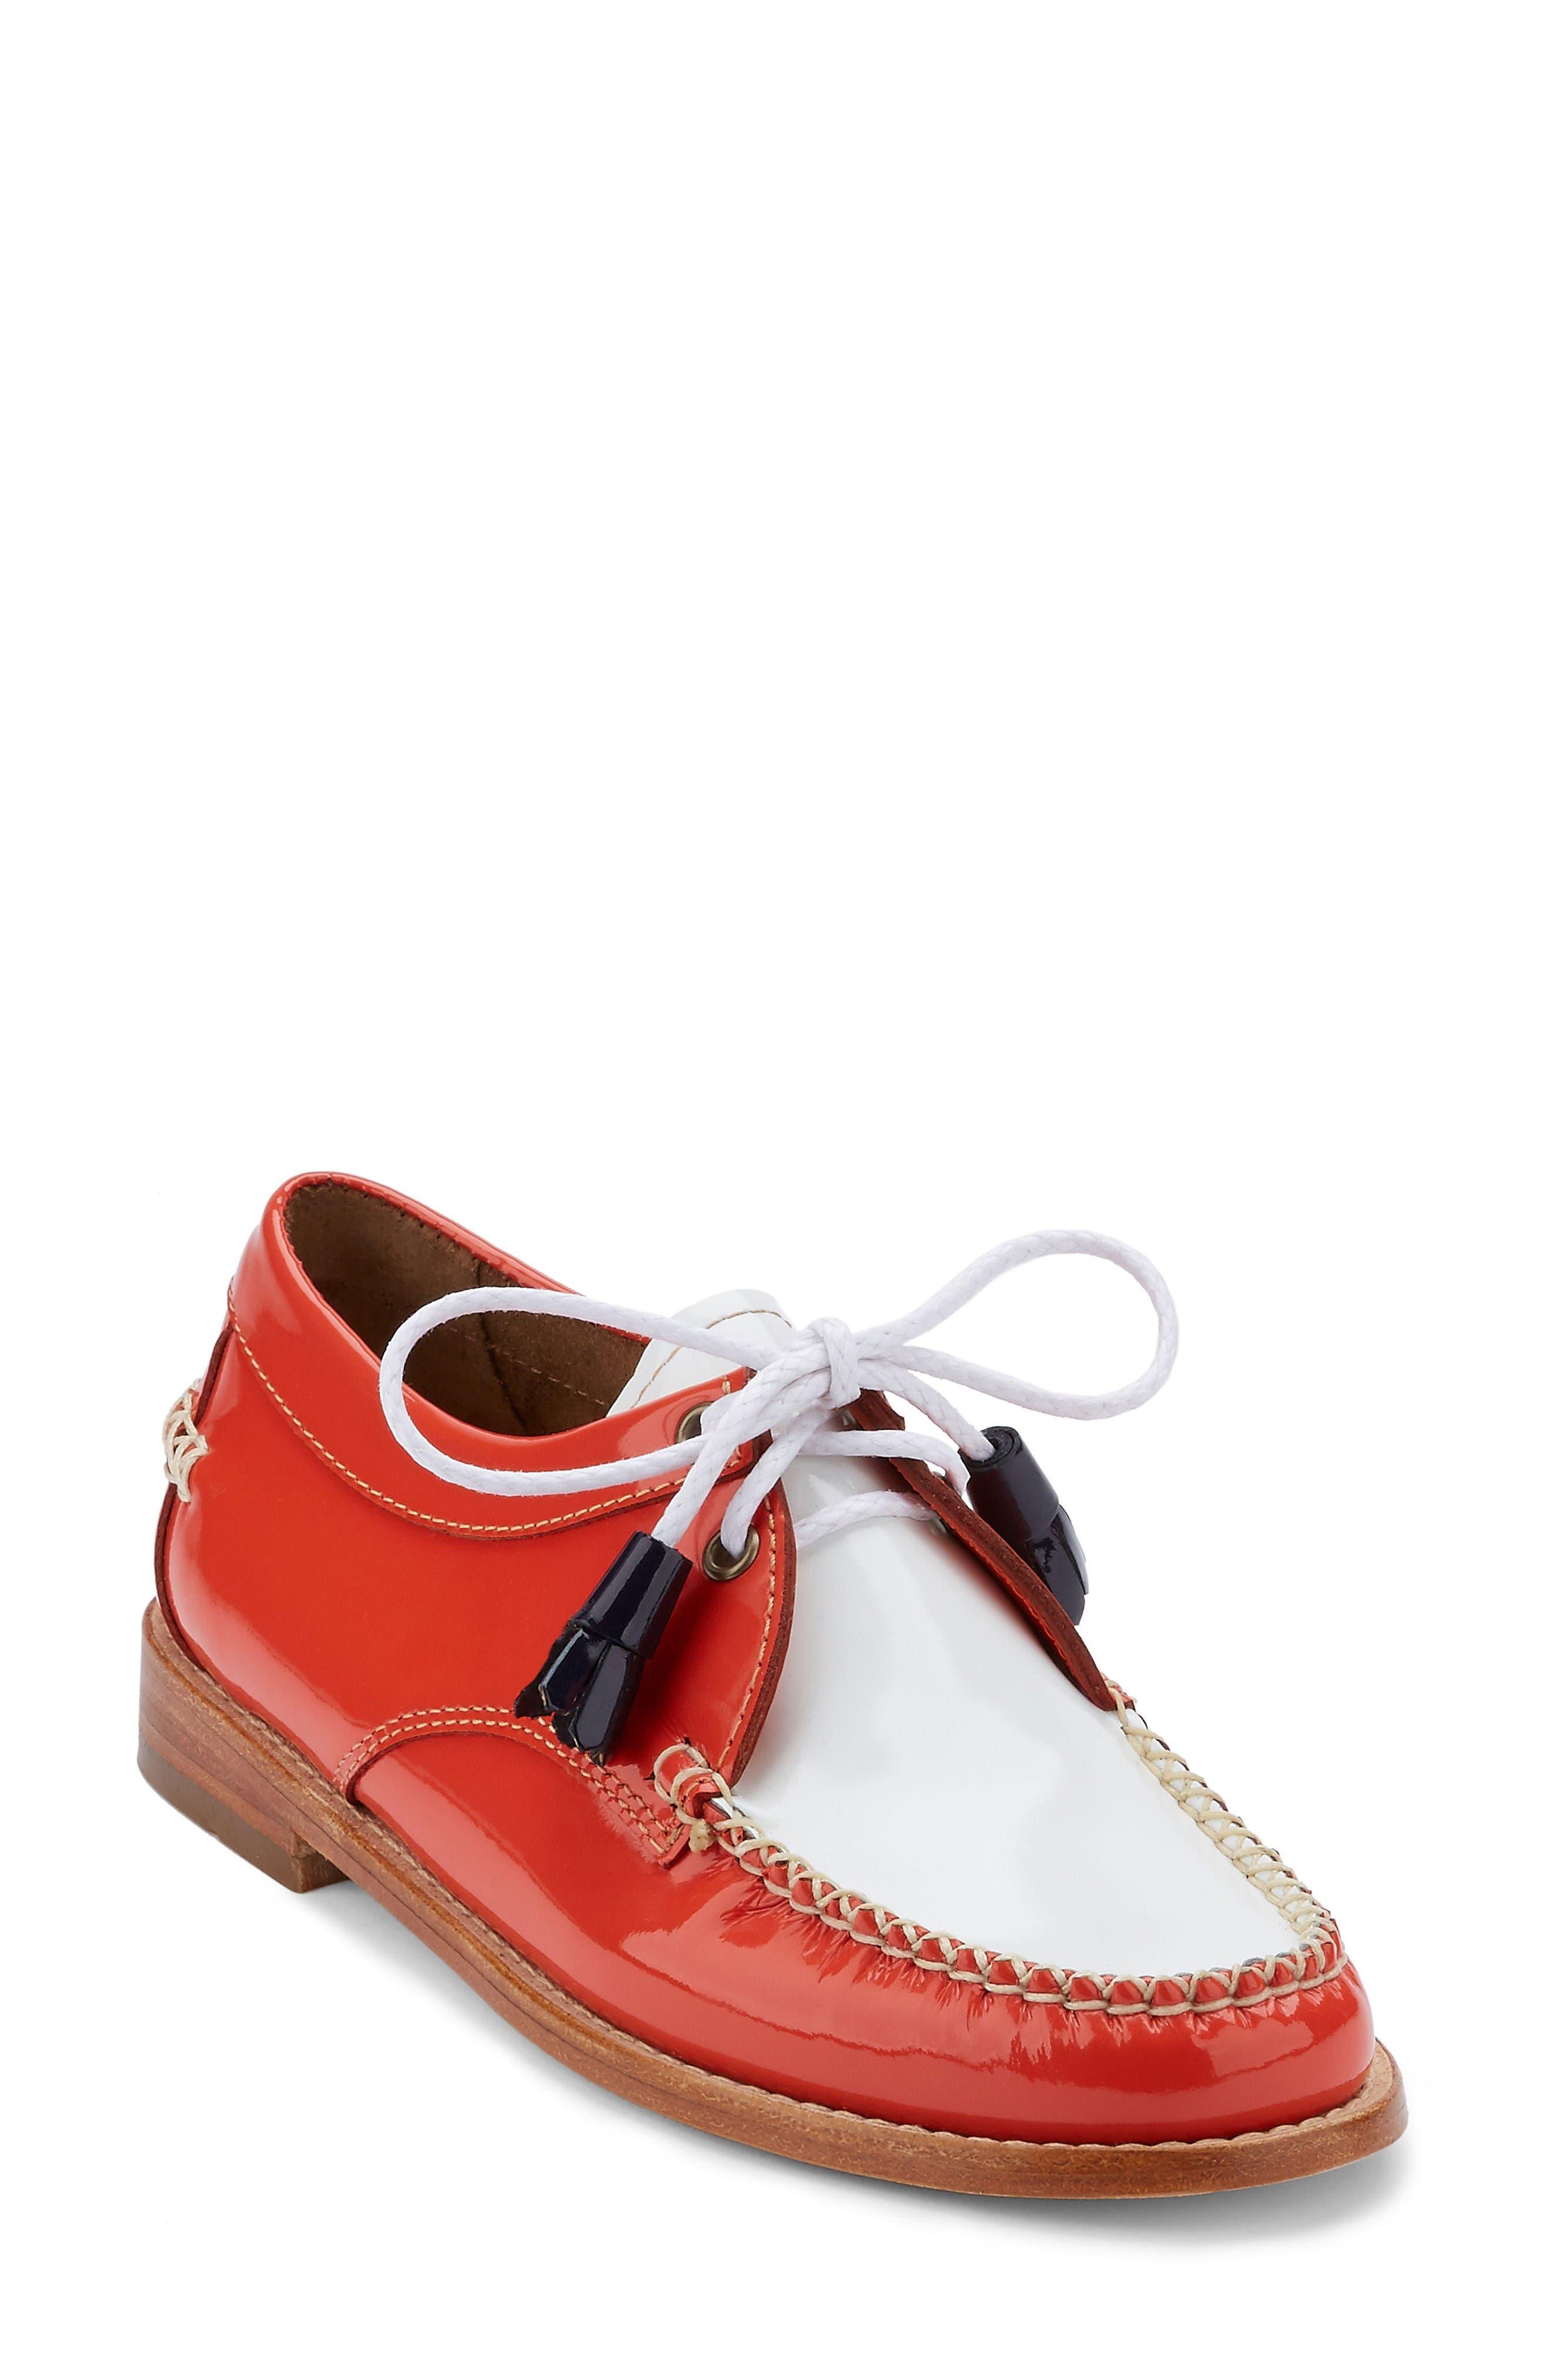 G.H. BASS & CO. Winnie Leather Oxford